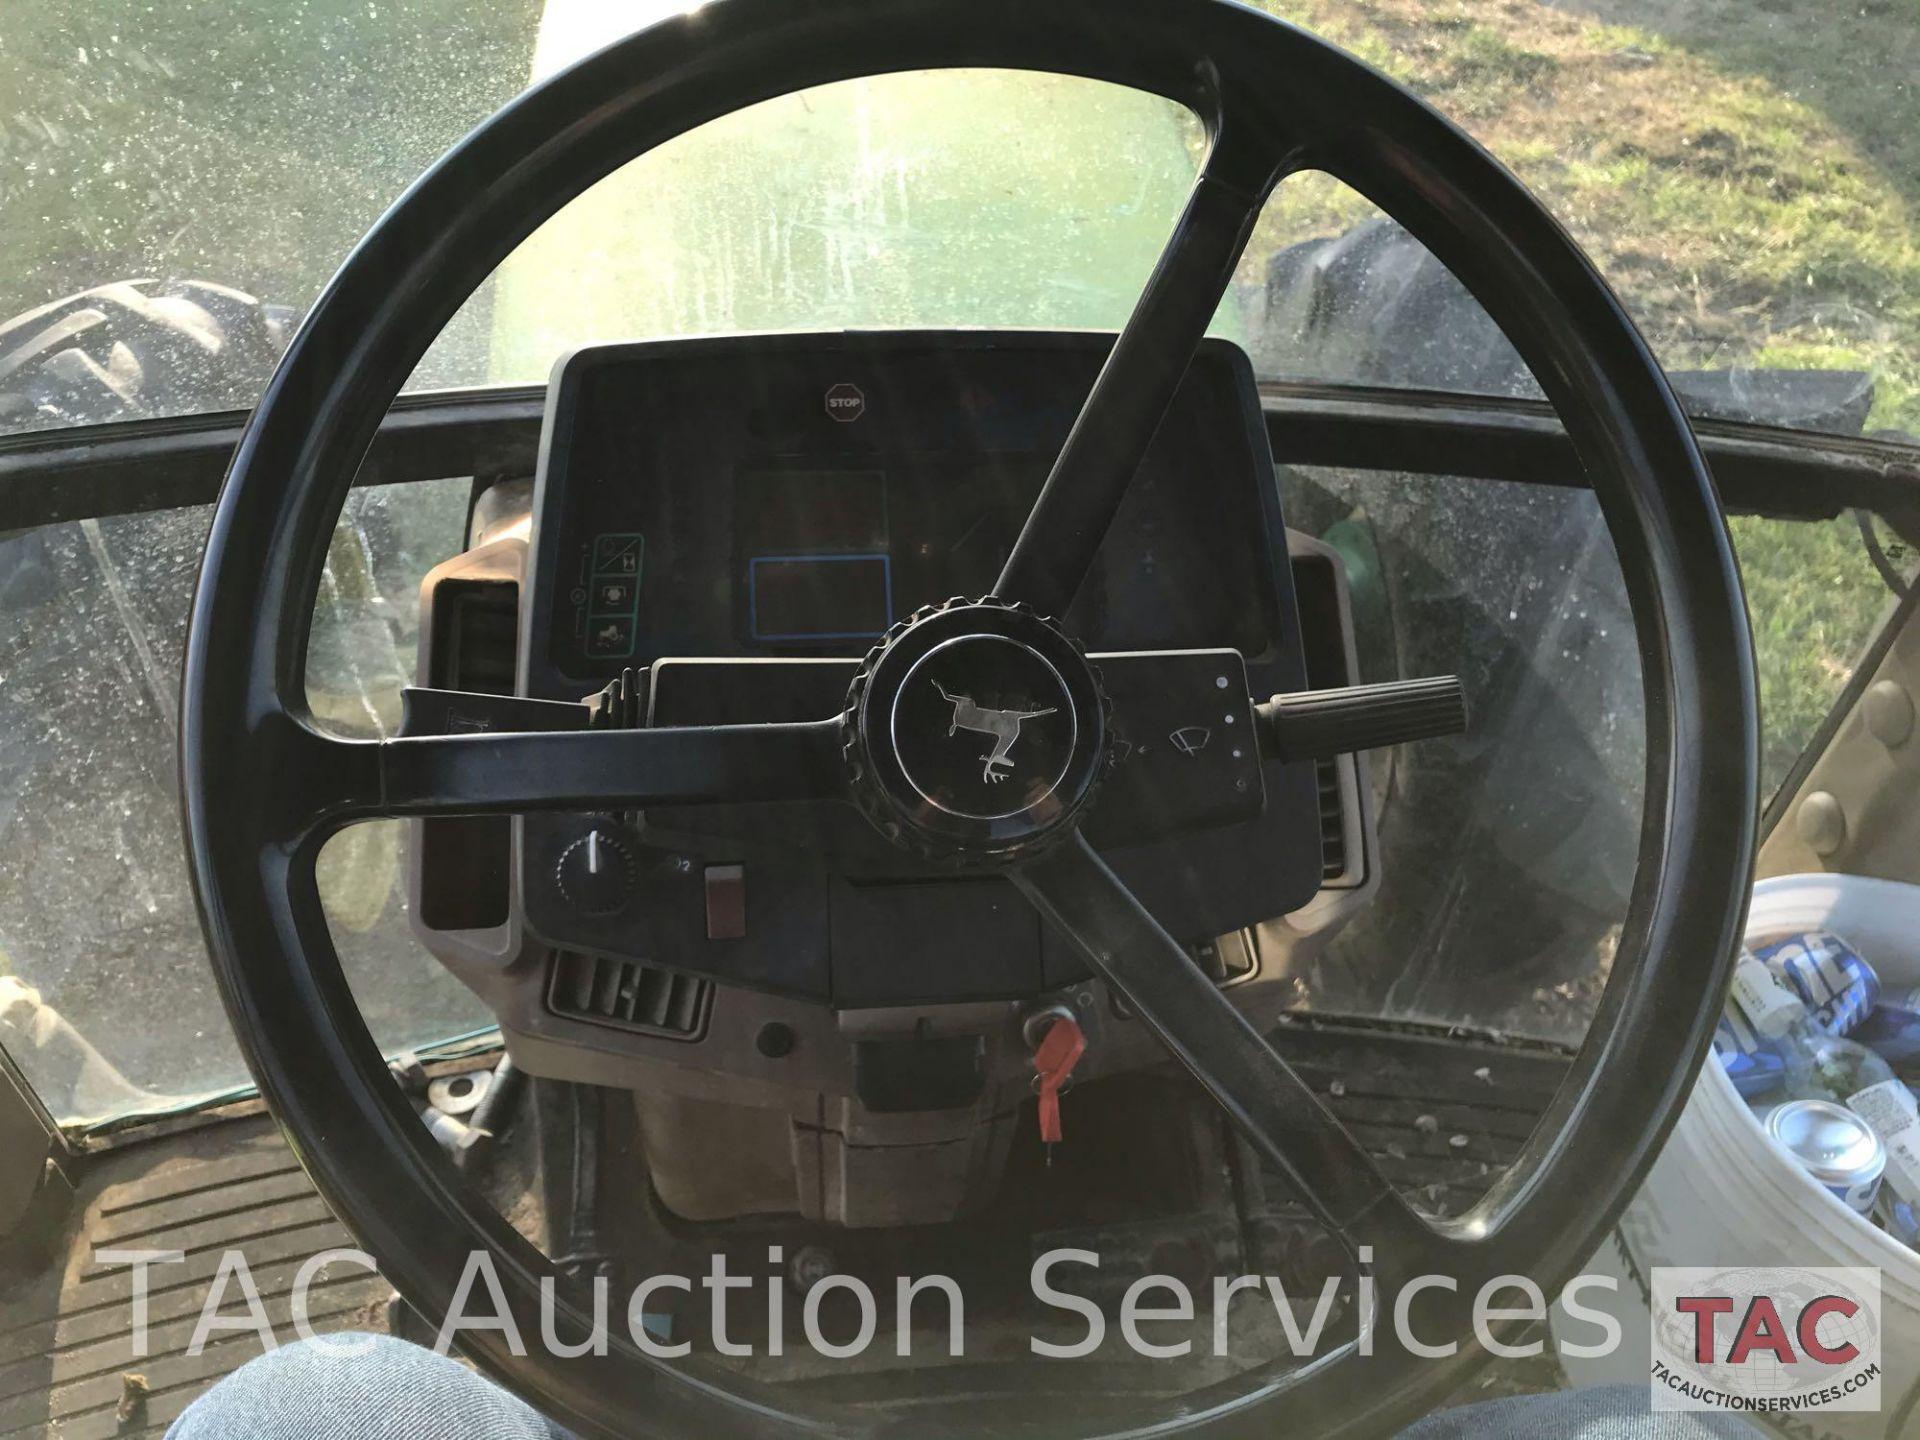 John Deere 7410 Farm Tractor - Image 9 of 24